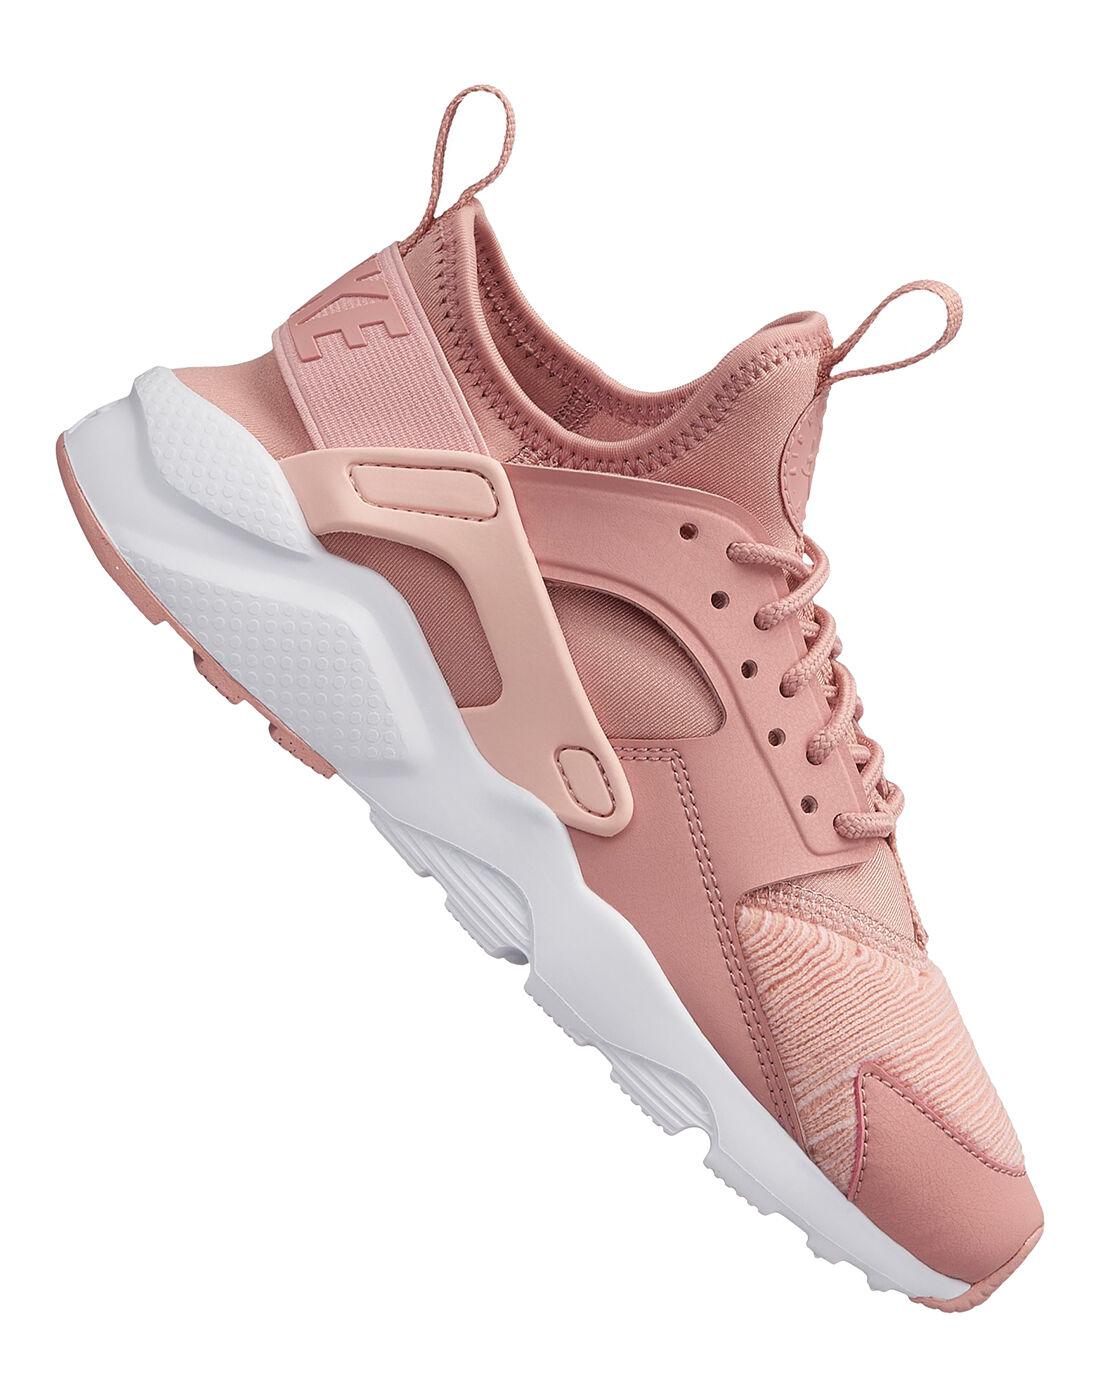 Nike Air Huarache Run Ultra | Pink